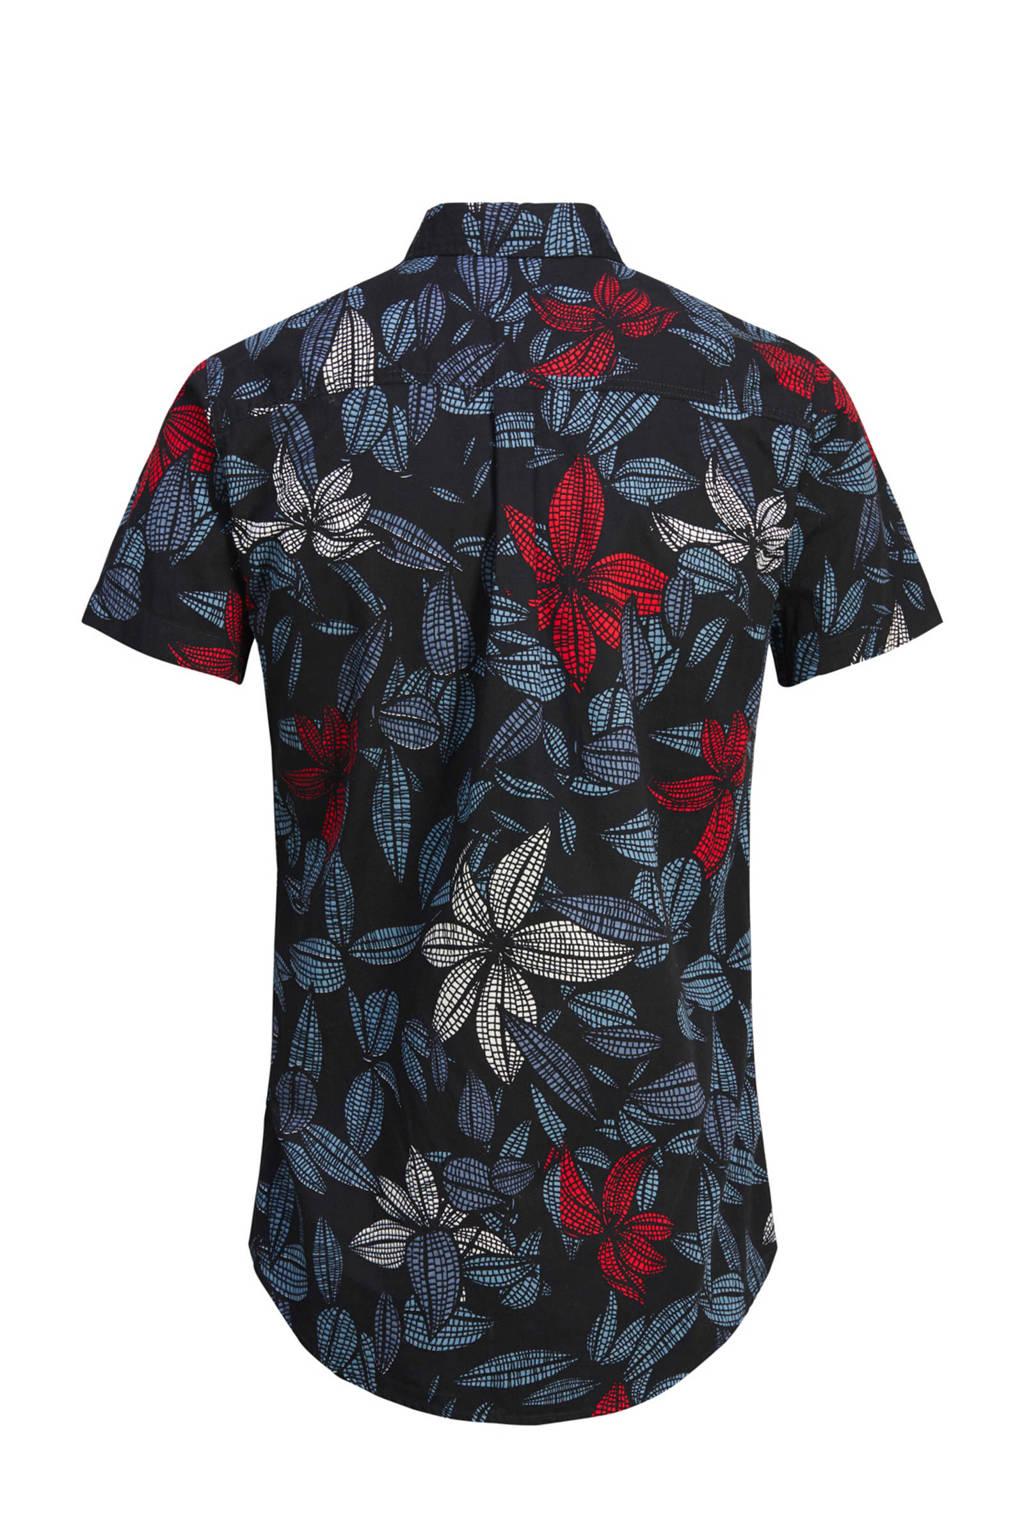 Rood Zwart Overhemd.Produkt Regular Fit Overhemd Met Print Wehkamp